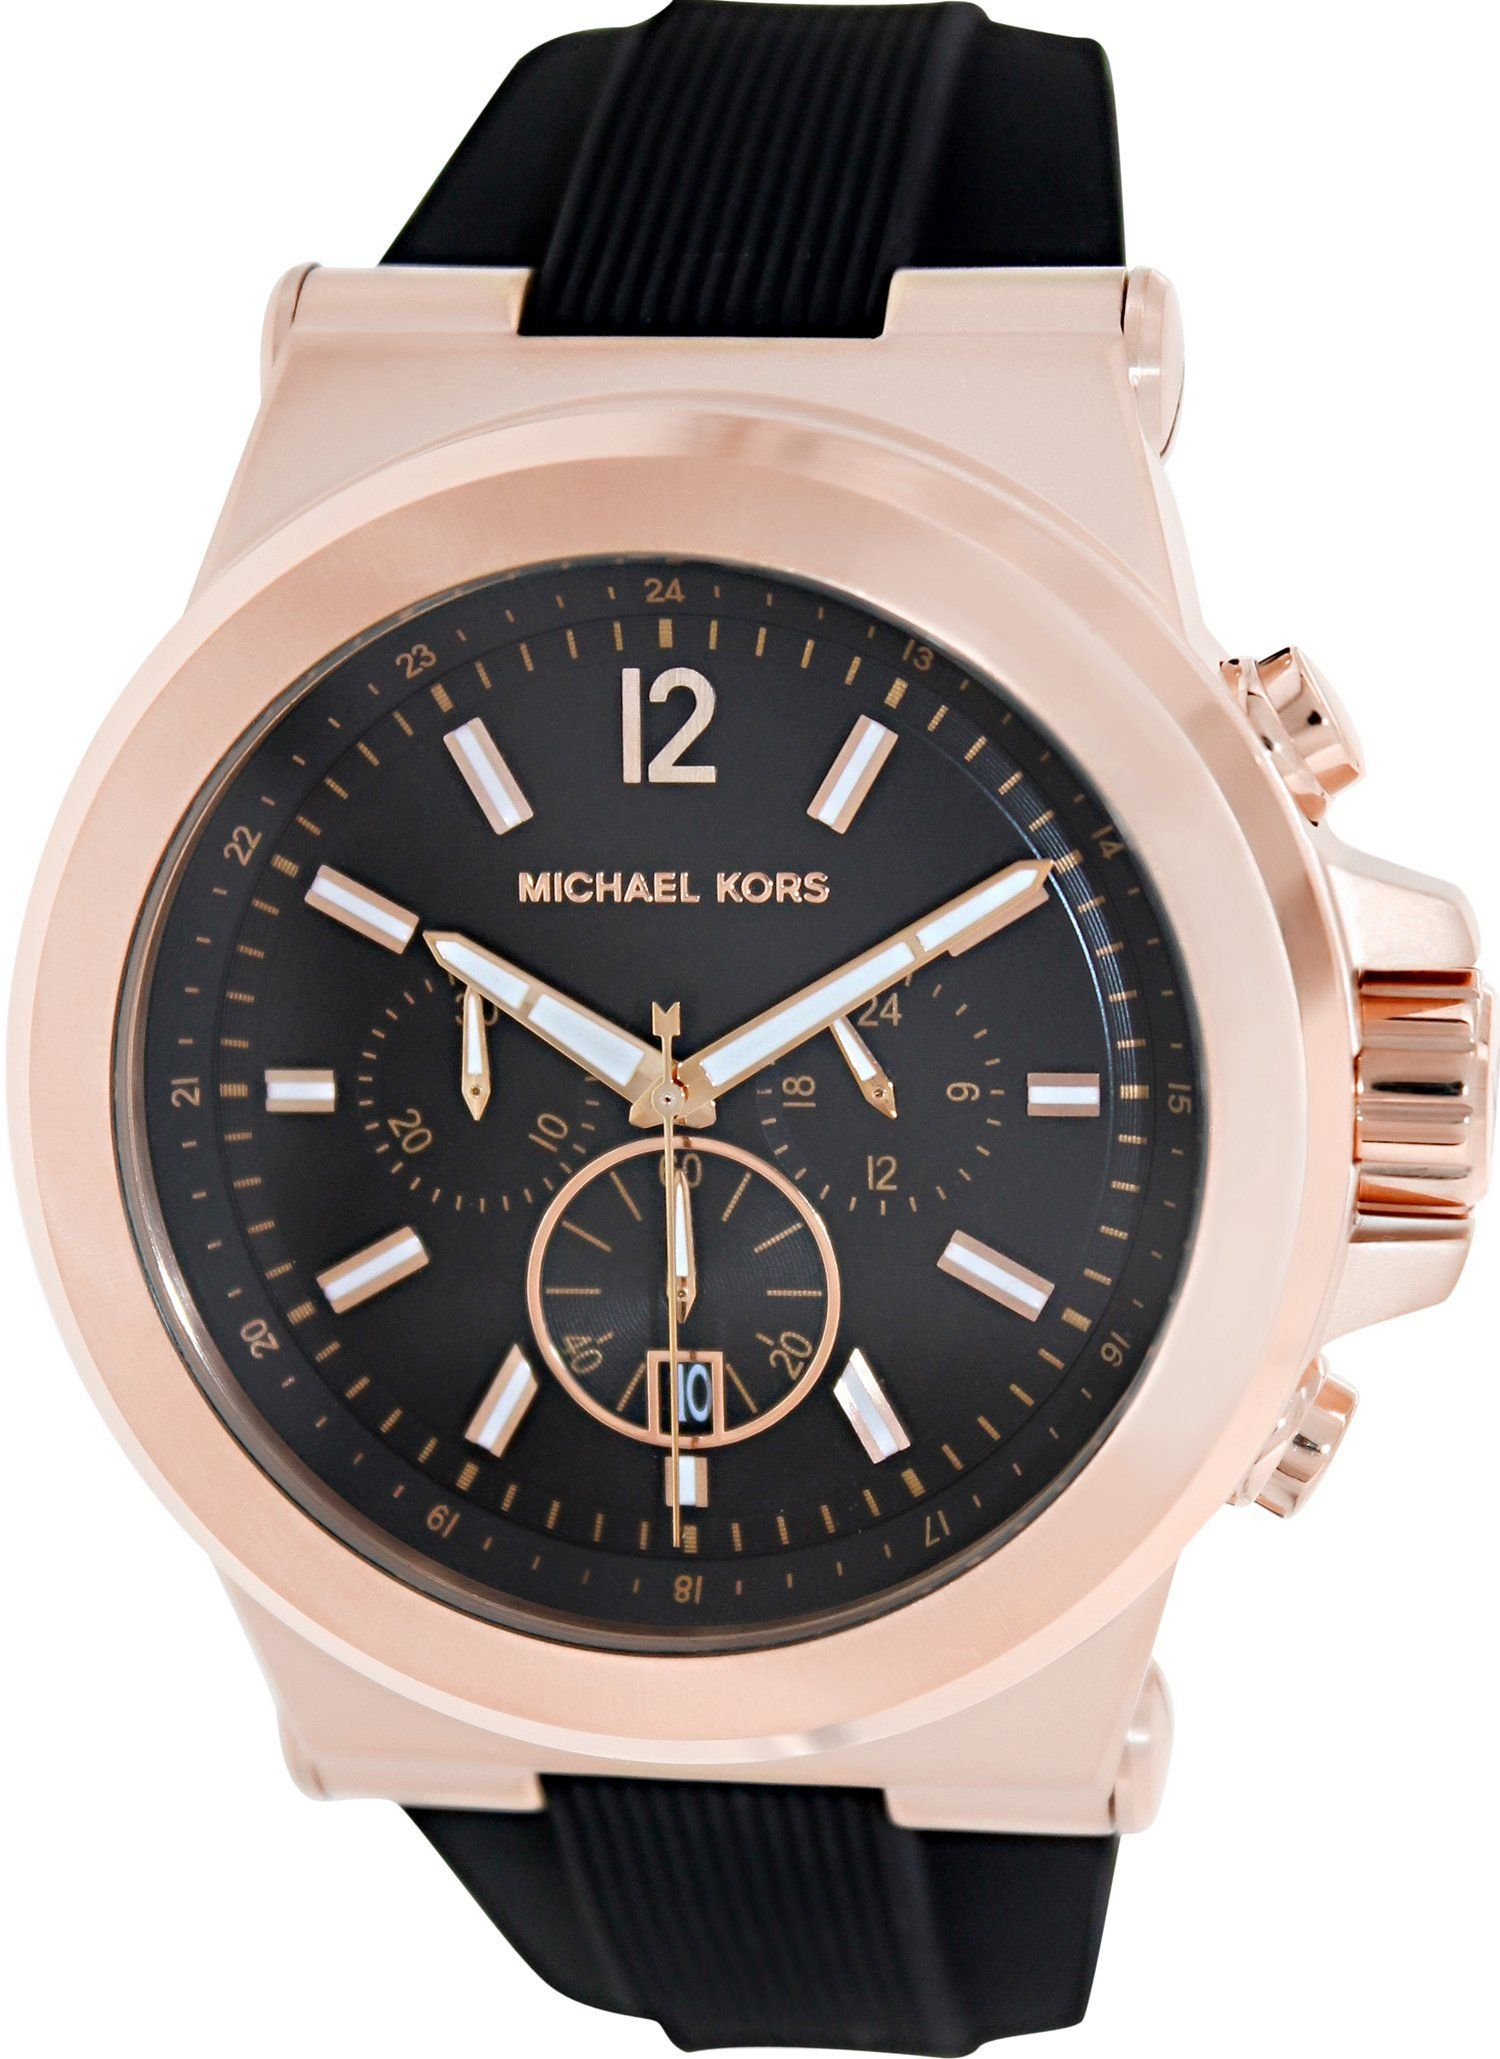 Amazon Michael Kors MK8184 Classic Watch Dial: Black chronograph: Michael Kors: Watches